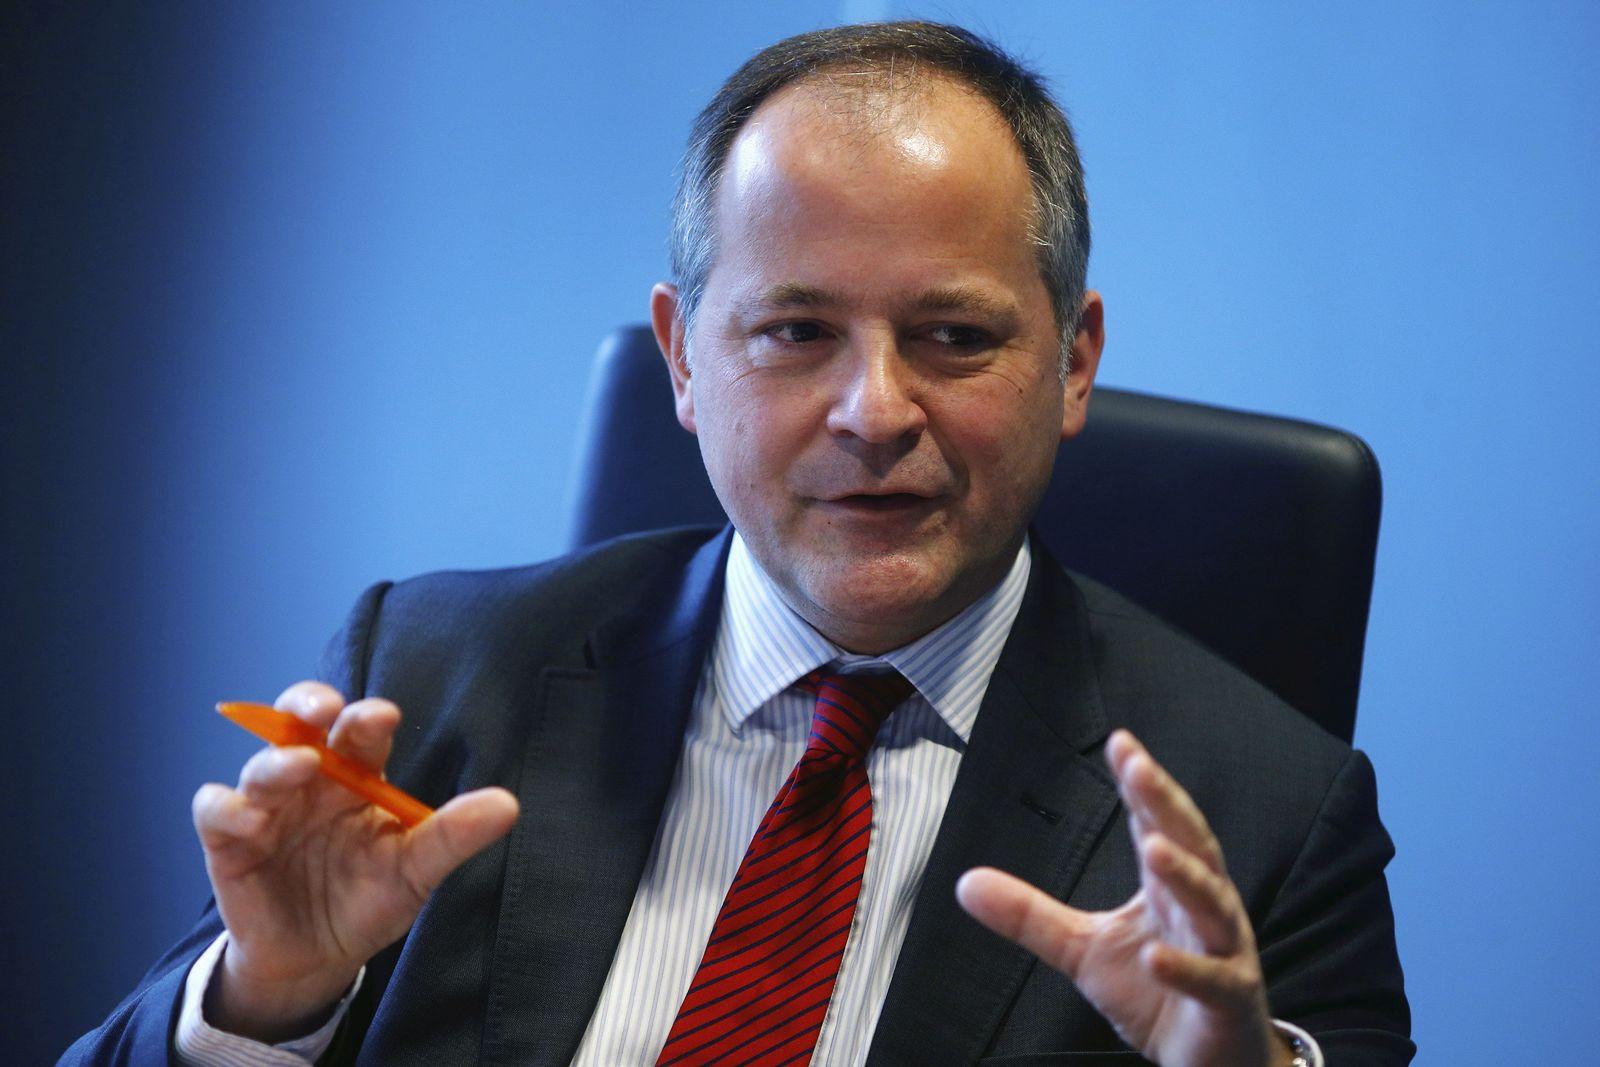 Benoit Coeure / EZB